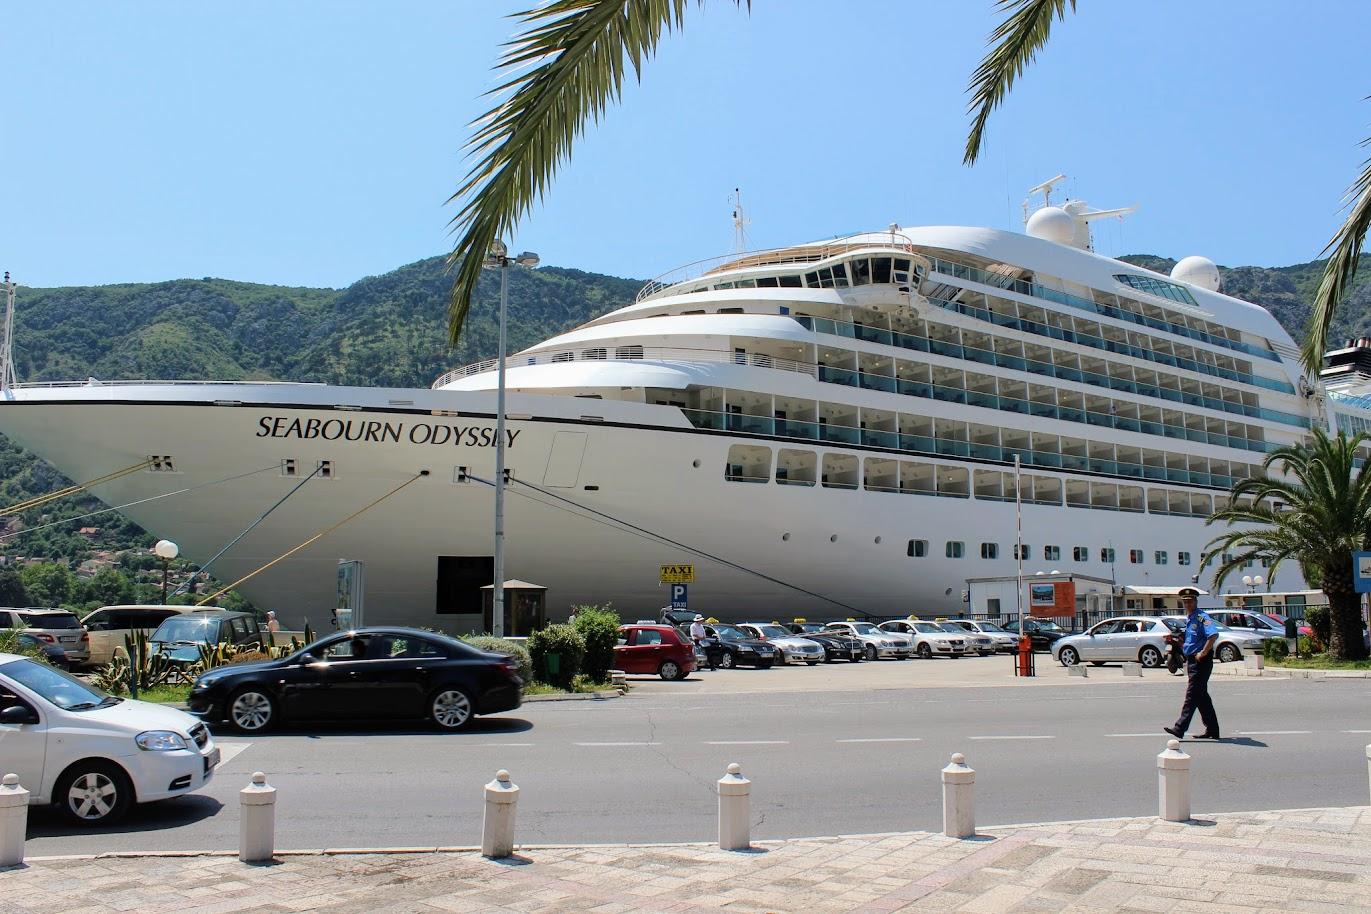 лайнер Seabourn Odyssey в Которе